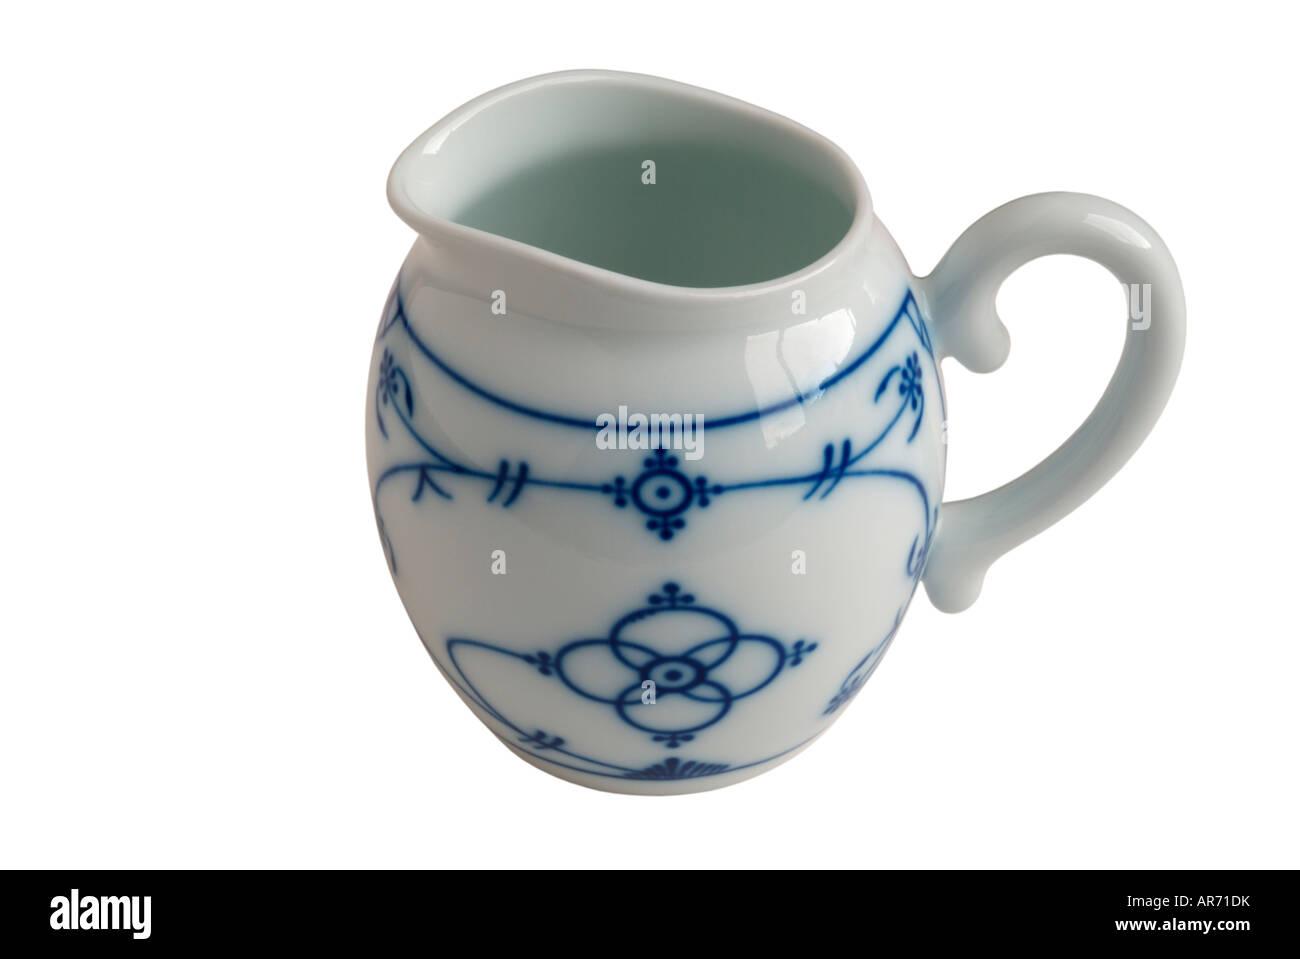 Blue and white Gerold Porzellan German pottery jug - Stock Image